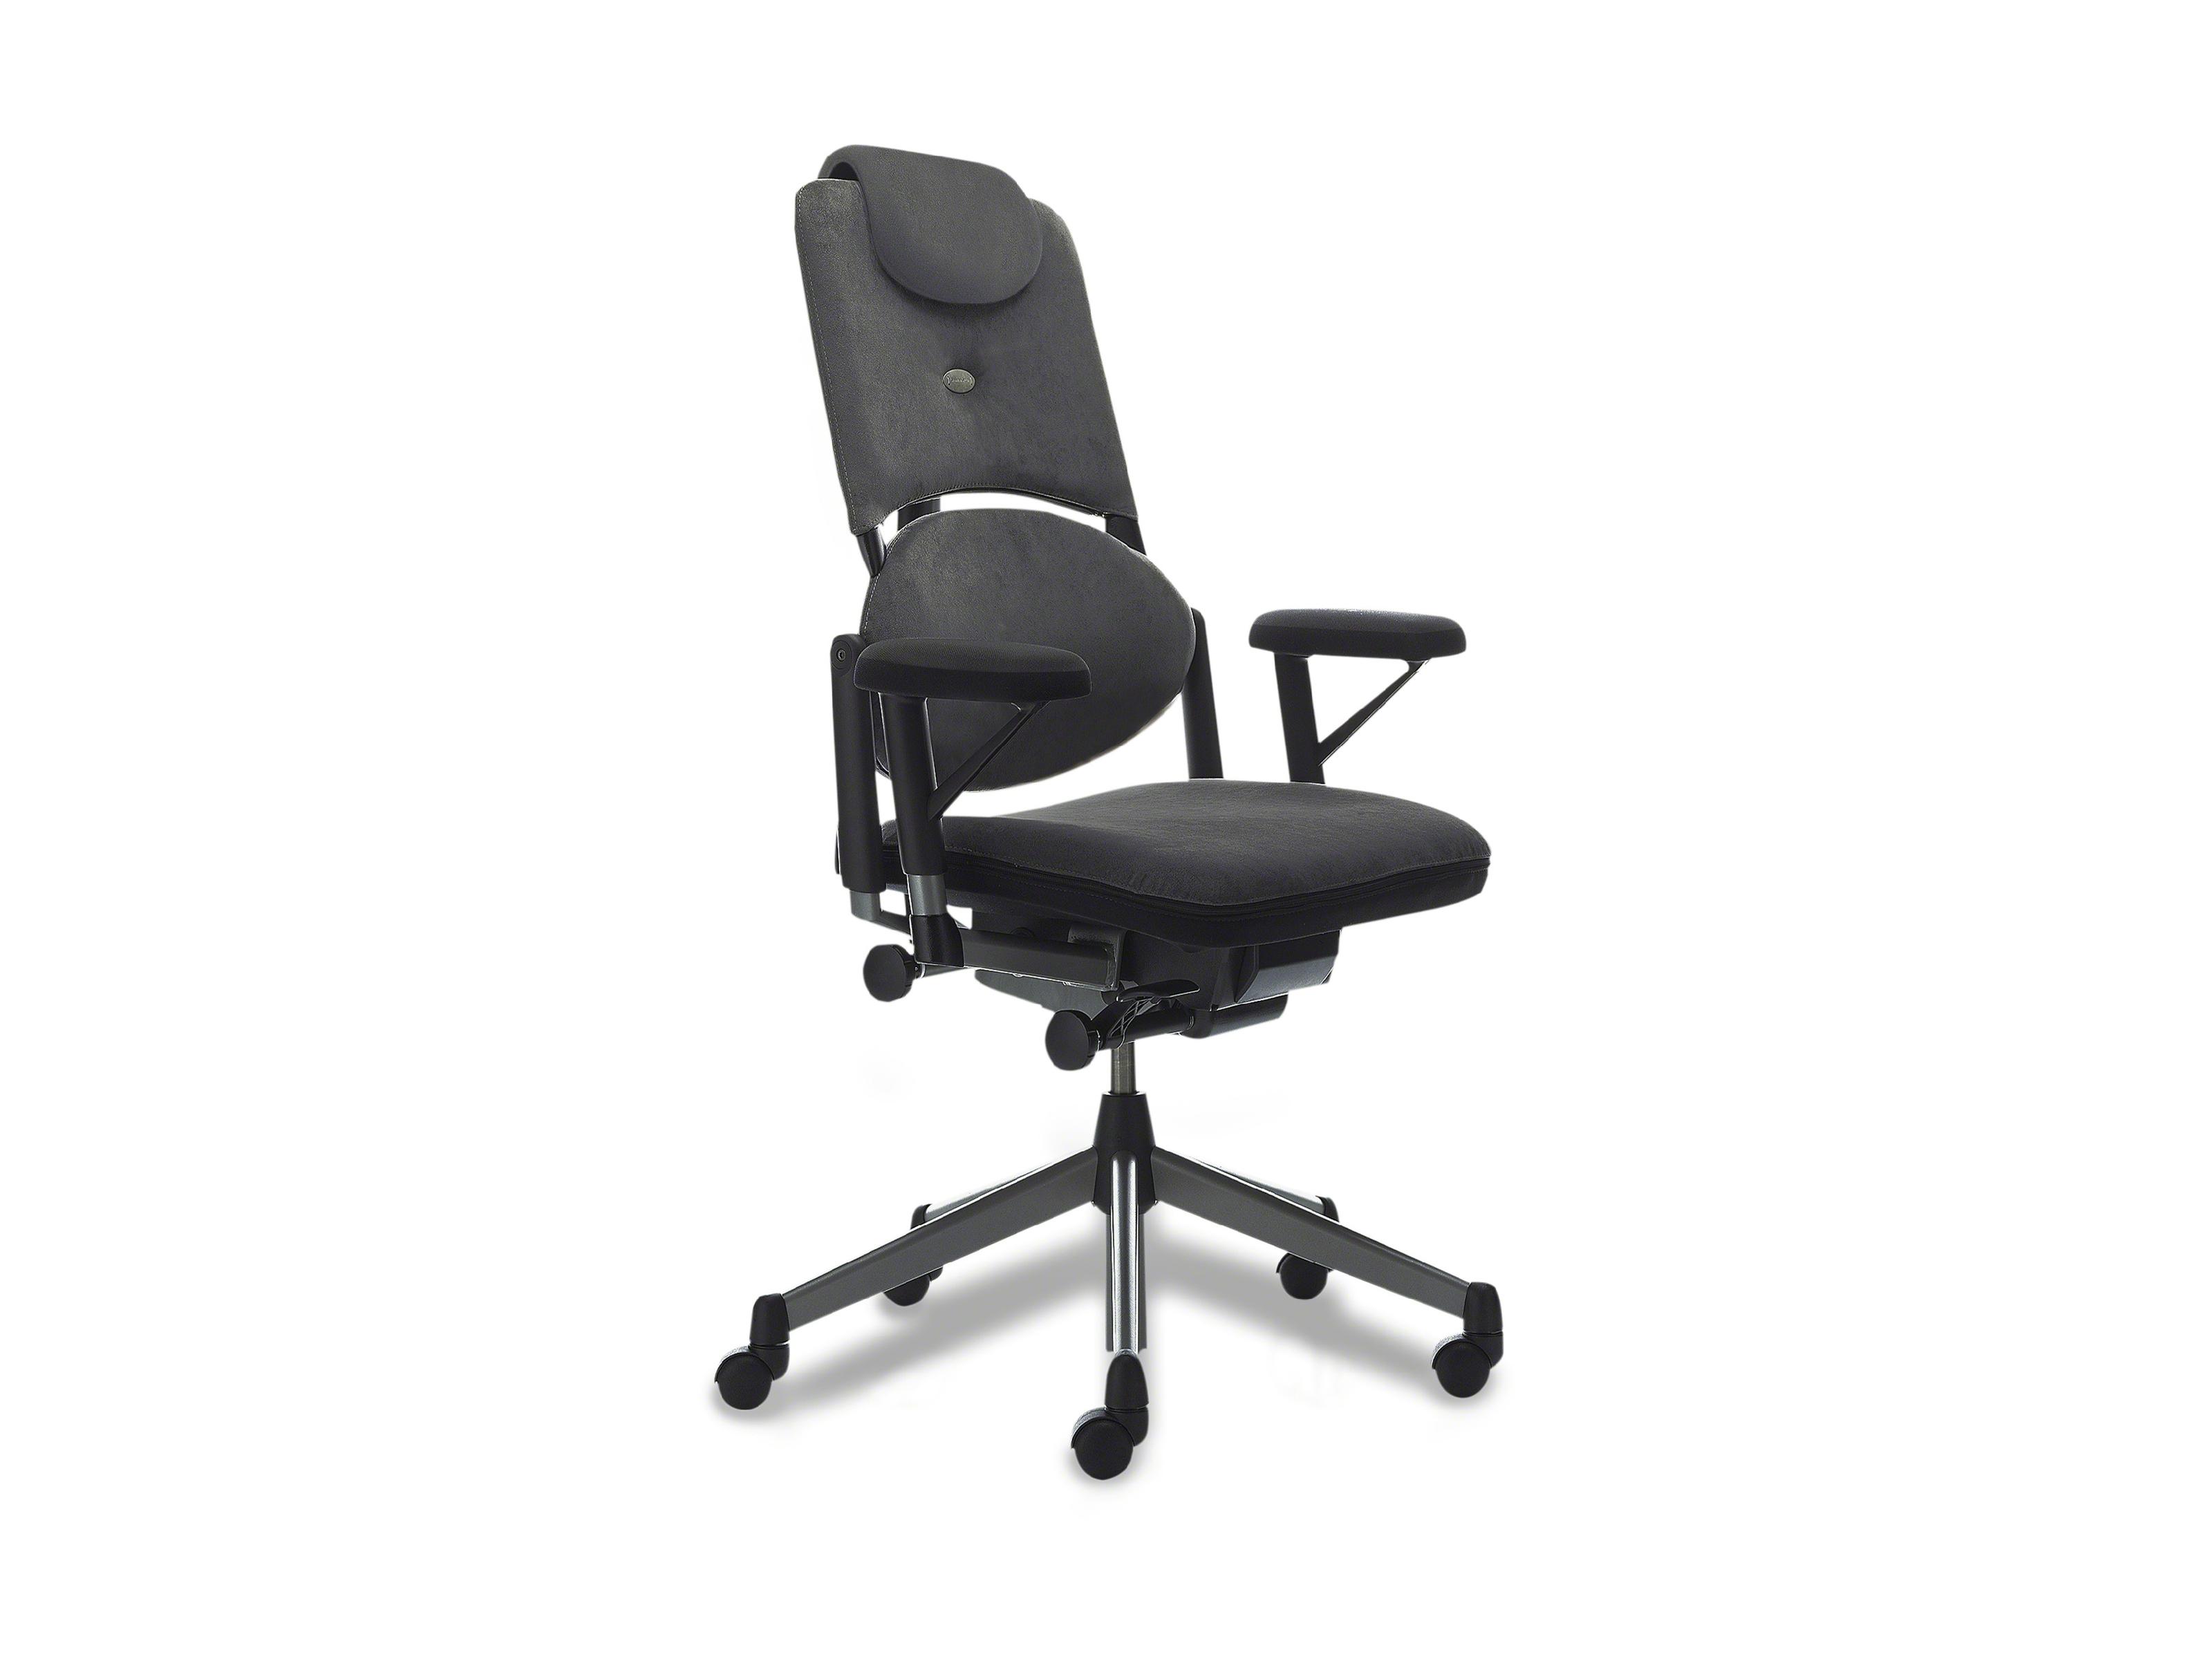 Siete pautas para elegir bien tu silla de oficina